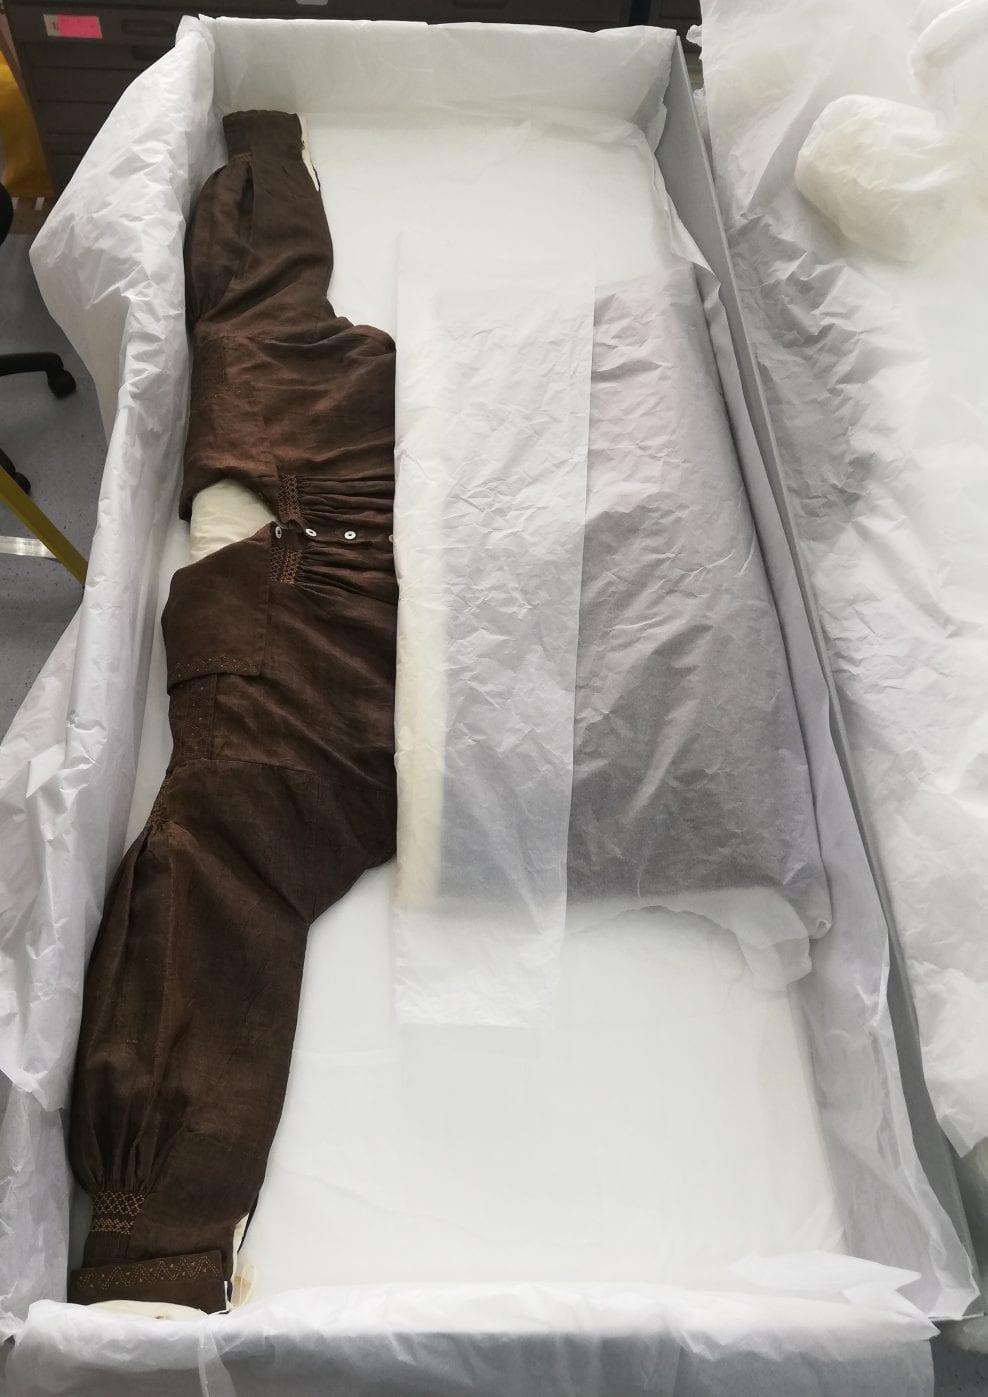 Waterproofed Smock from Worthing Museum